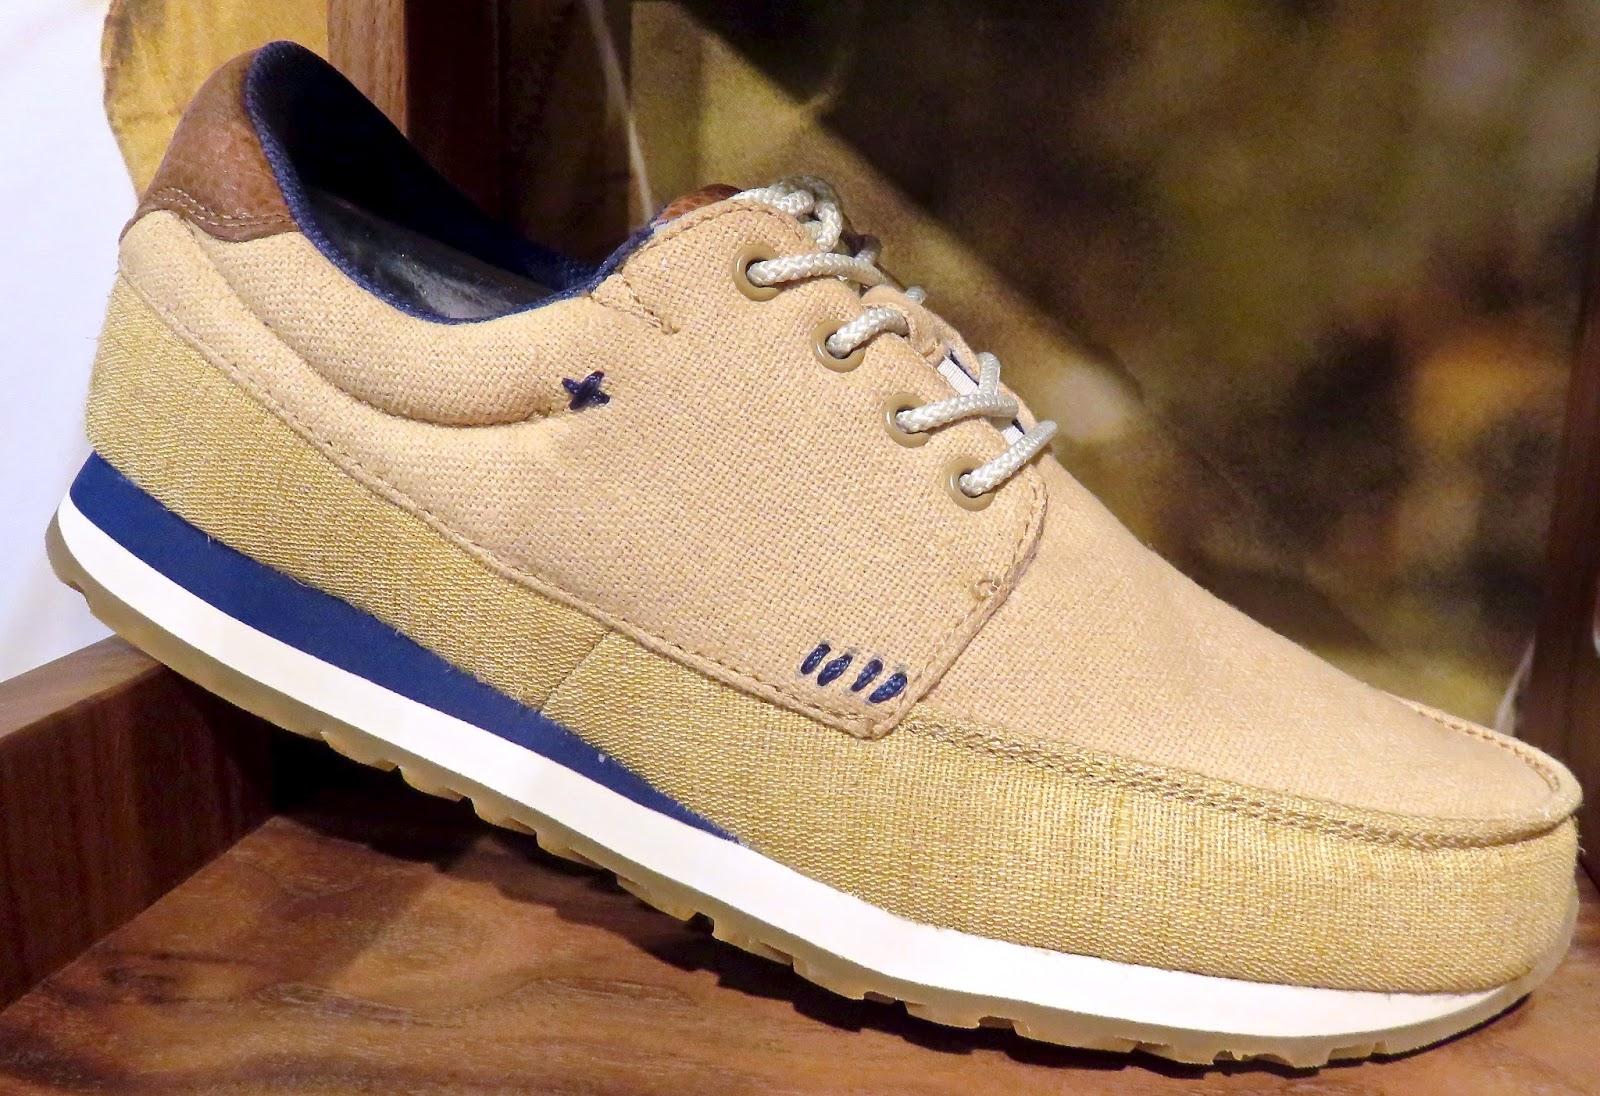 9a0fbaba82 SANUK- FUN Footwear Featuring Serious Comfort